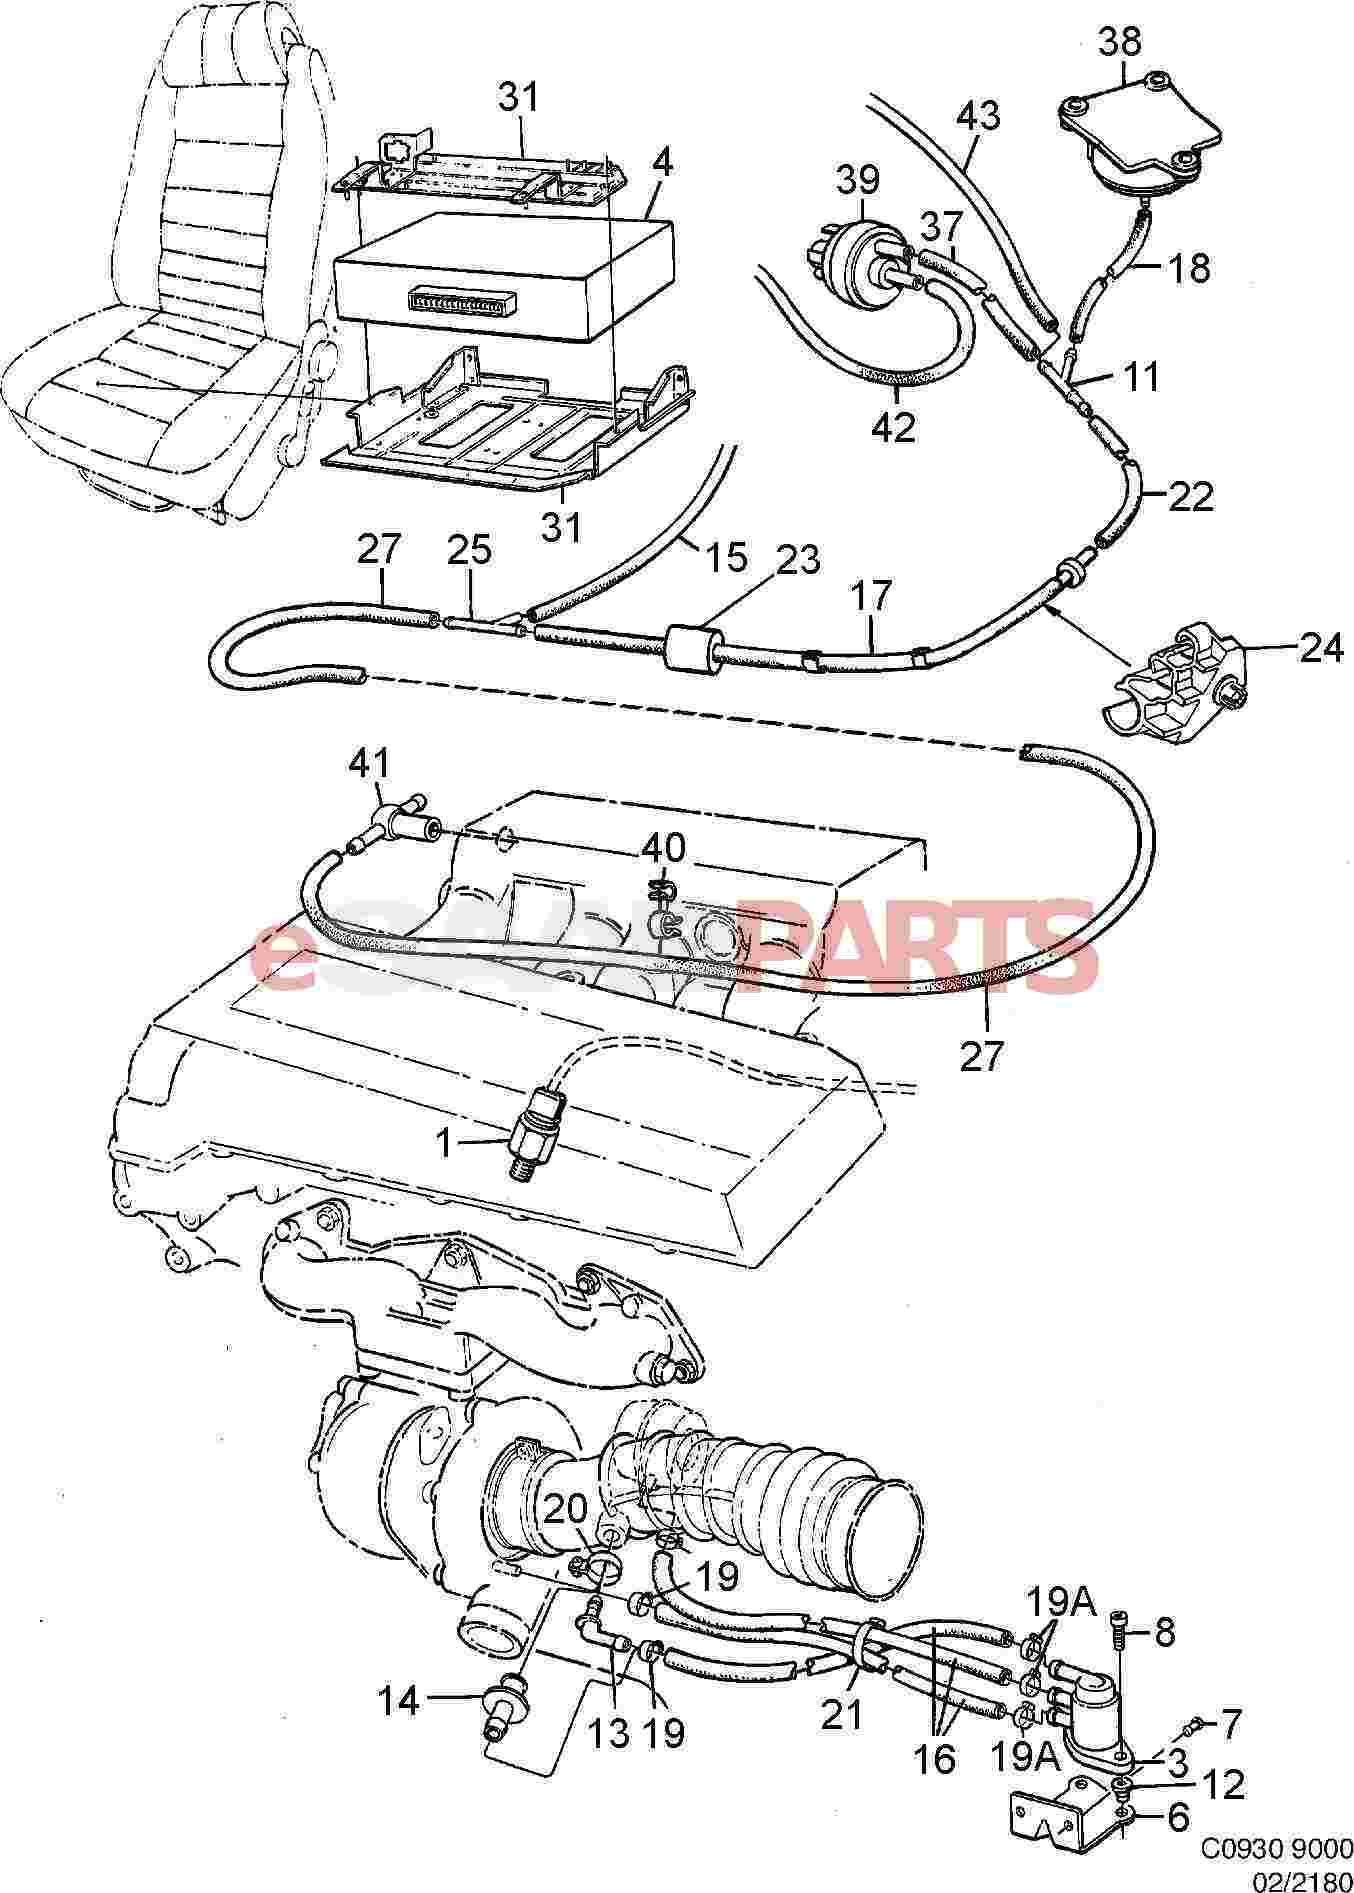 [7485576] saab boost pressure control valve - genuine saab ... saab fuel pressure diagram chevrolet fuel pressure diagram